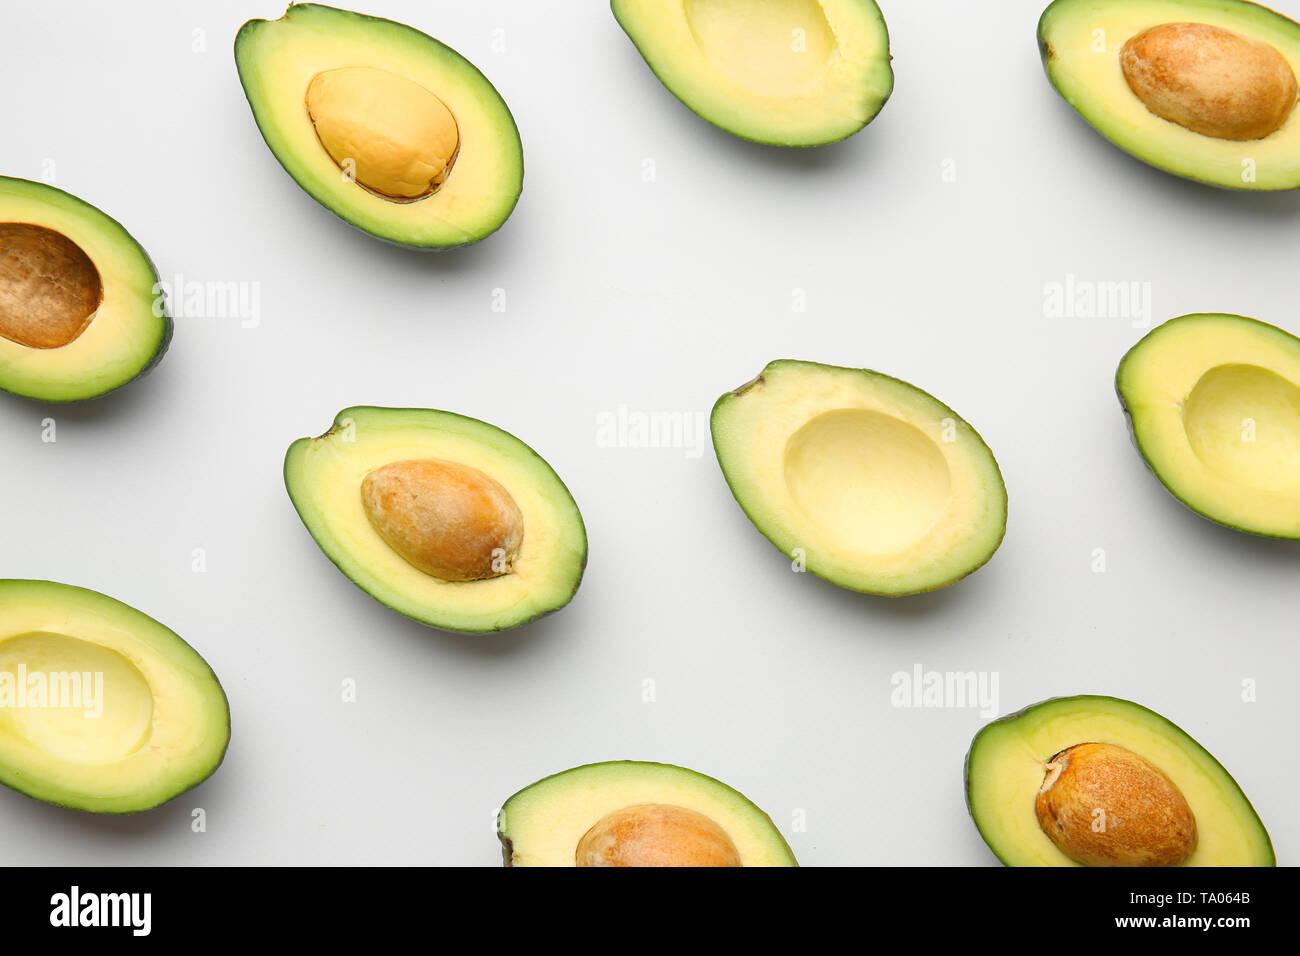 Plenty of fresh avocados on white background - Stock Image